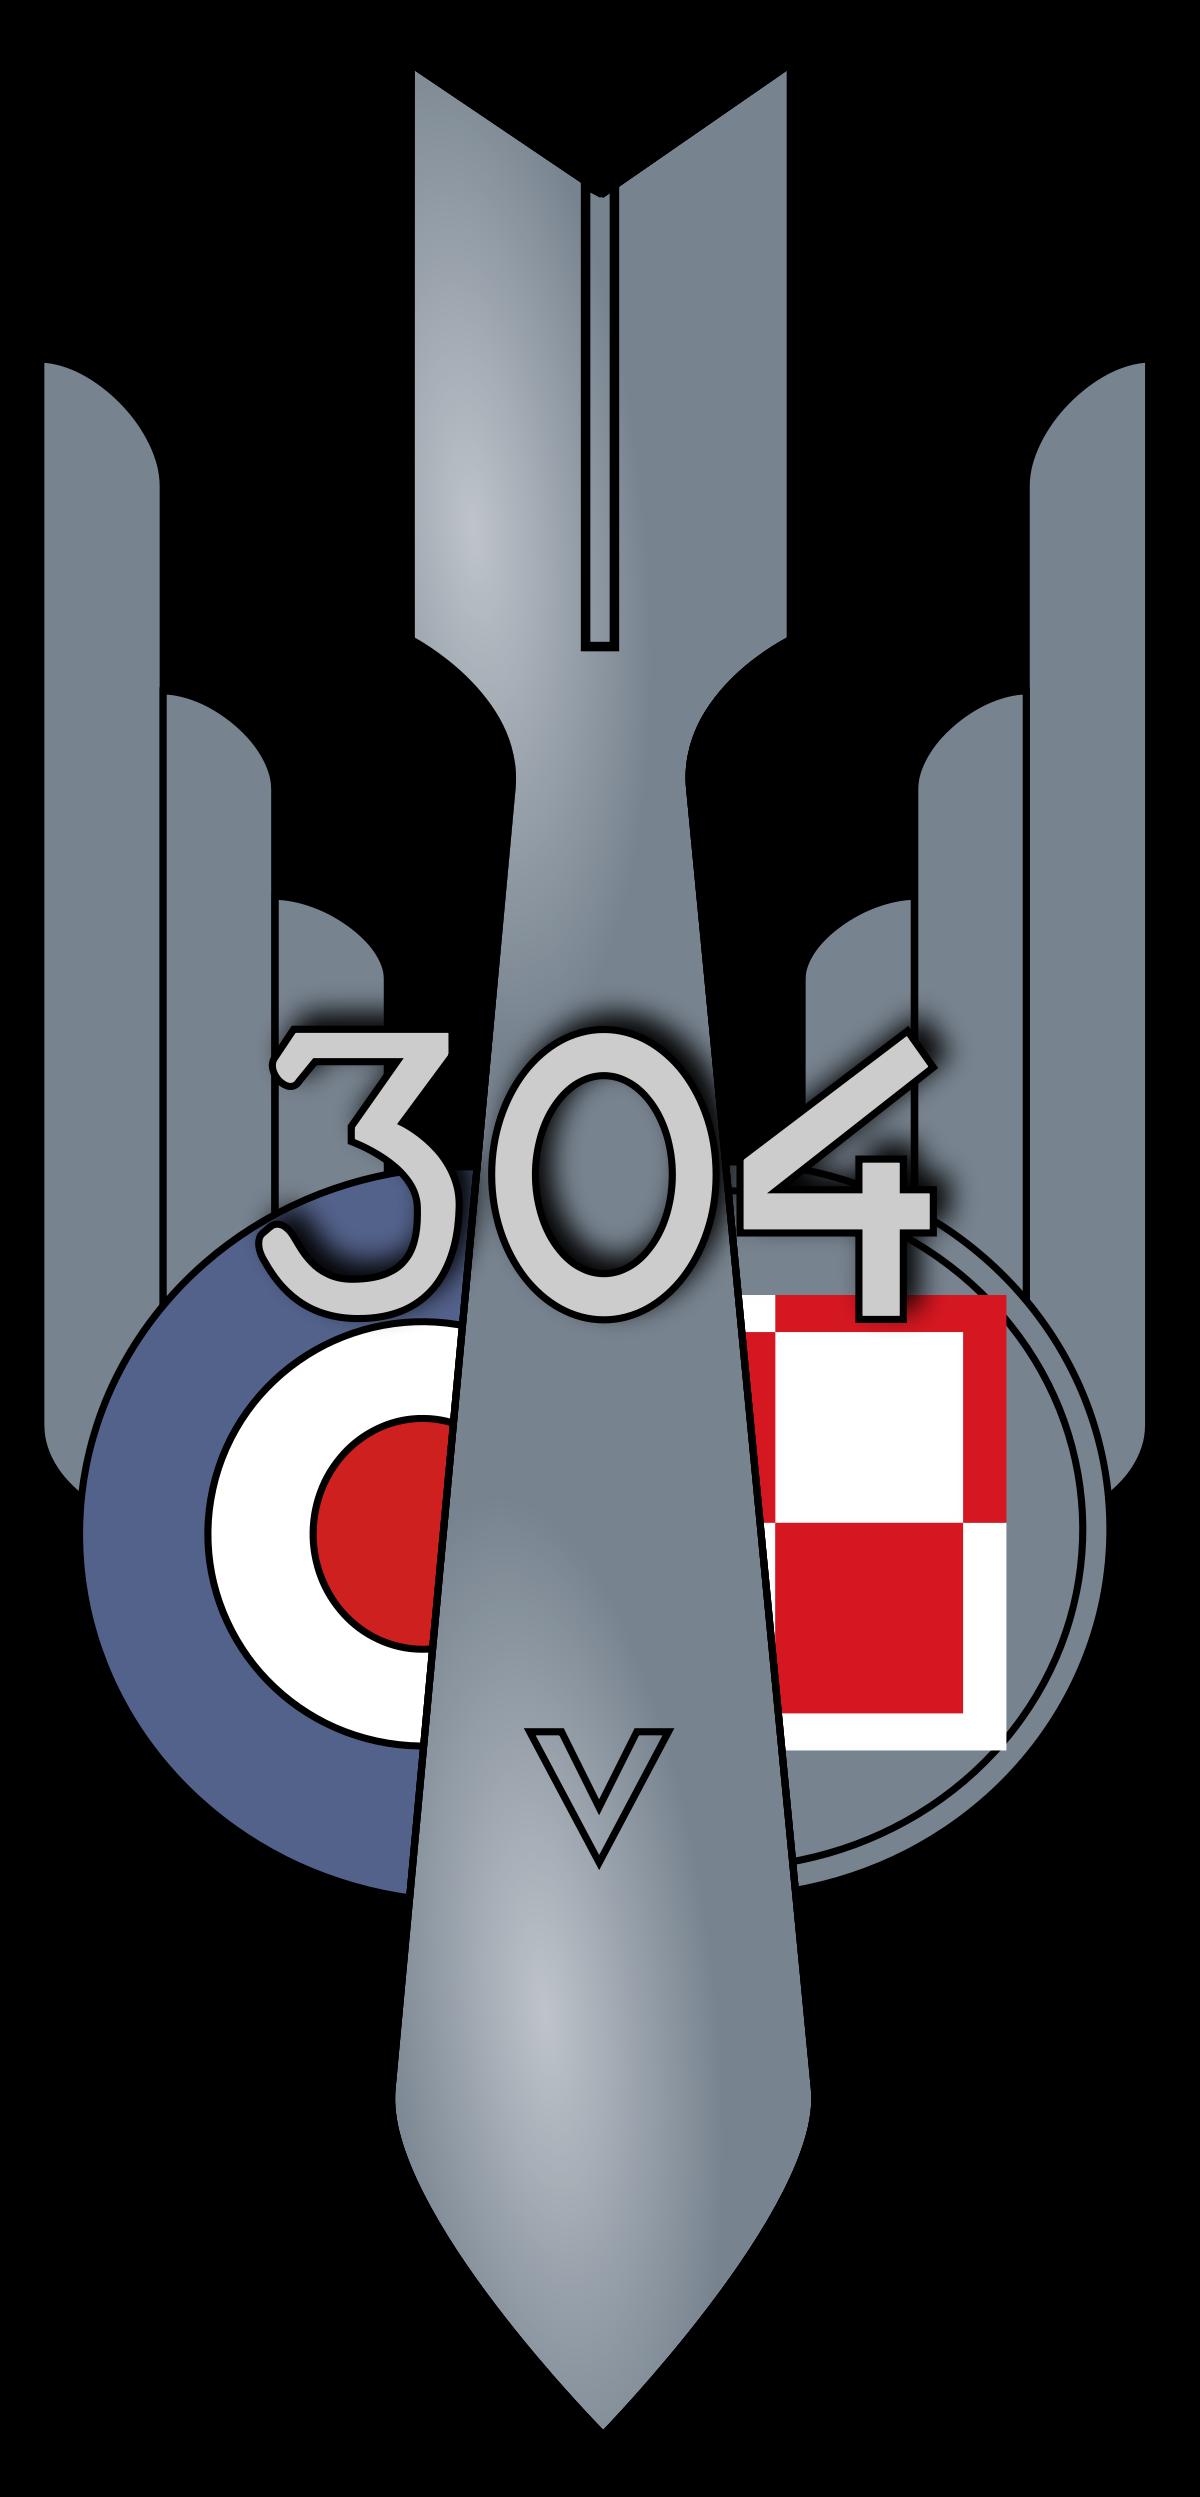 No. 304 Polish Bomber Squadron.